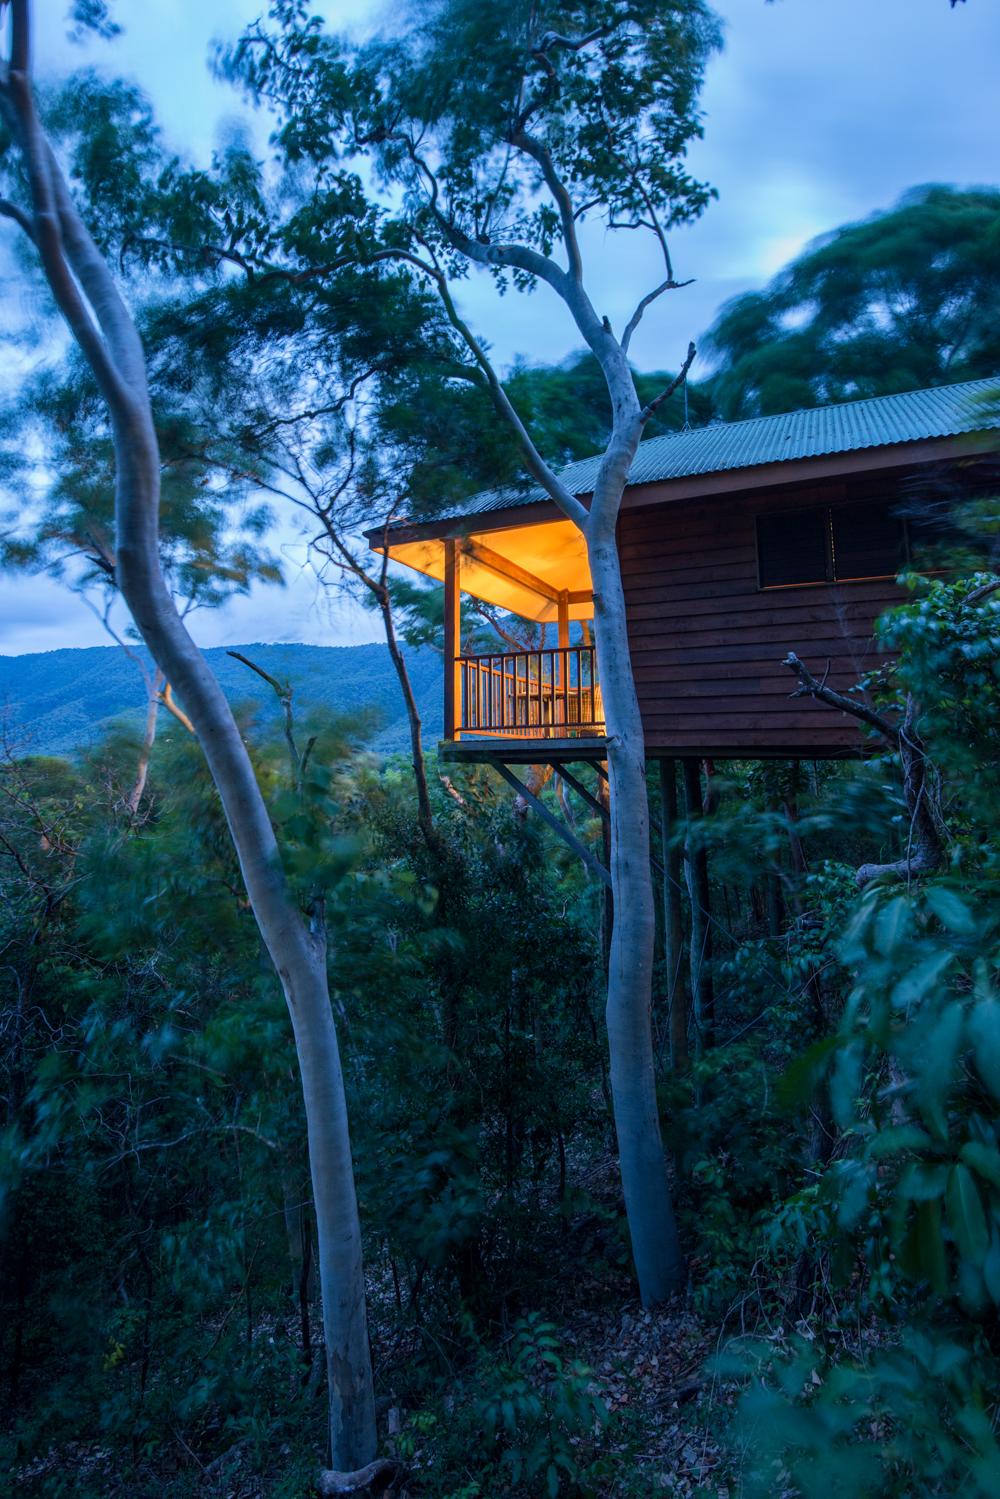 http://www.thalabeach.com.au/wp-content/uploads/2010/07/Thala_Beach_Nature_Reserve_2016__148.jpg